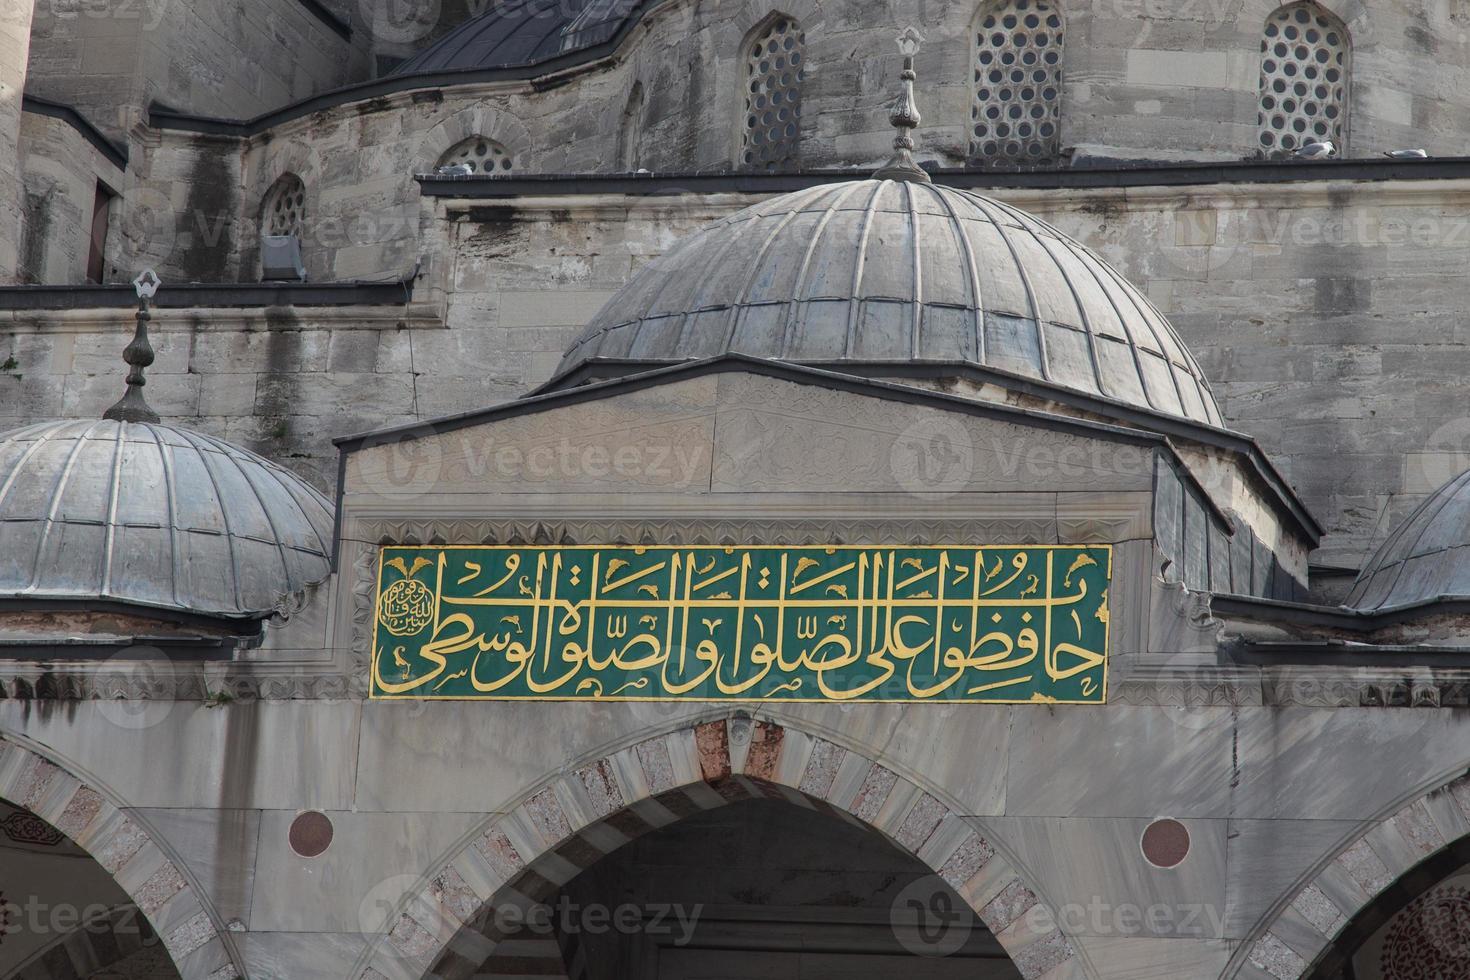 sultan ahmed blå moské foto